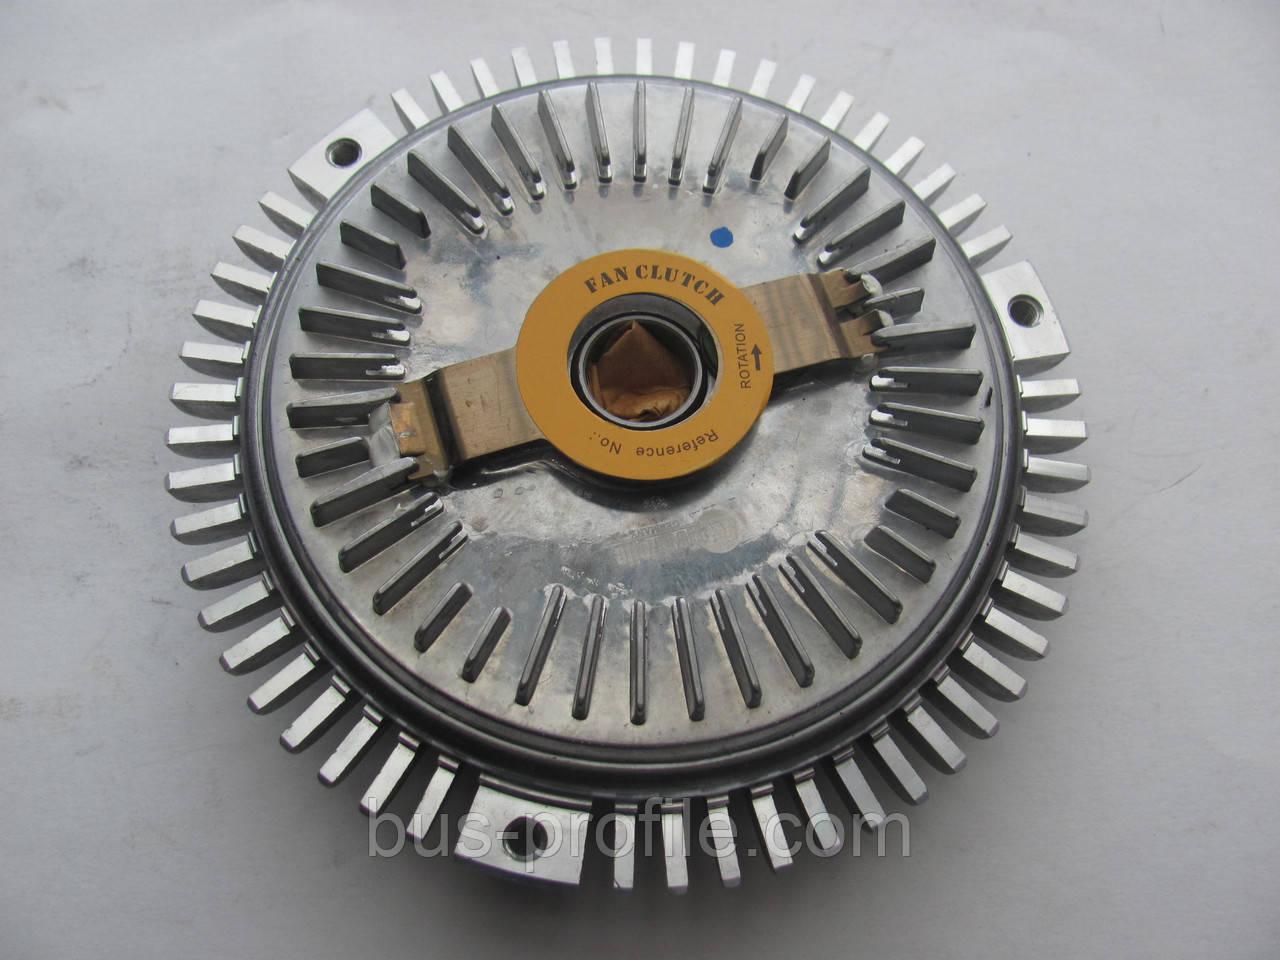 Муфта вентилятора на MB Sprinter 2.2, 2.7 Cdi 2000-2006 — Autotechteile — ATT2052